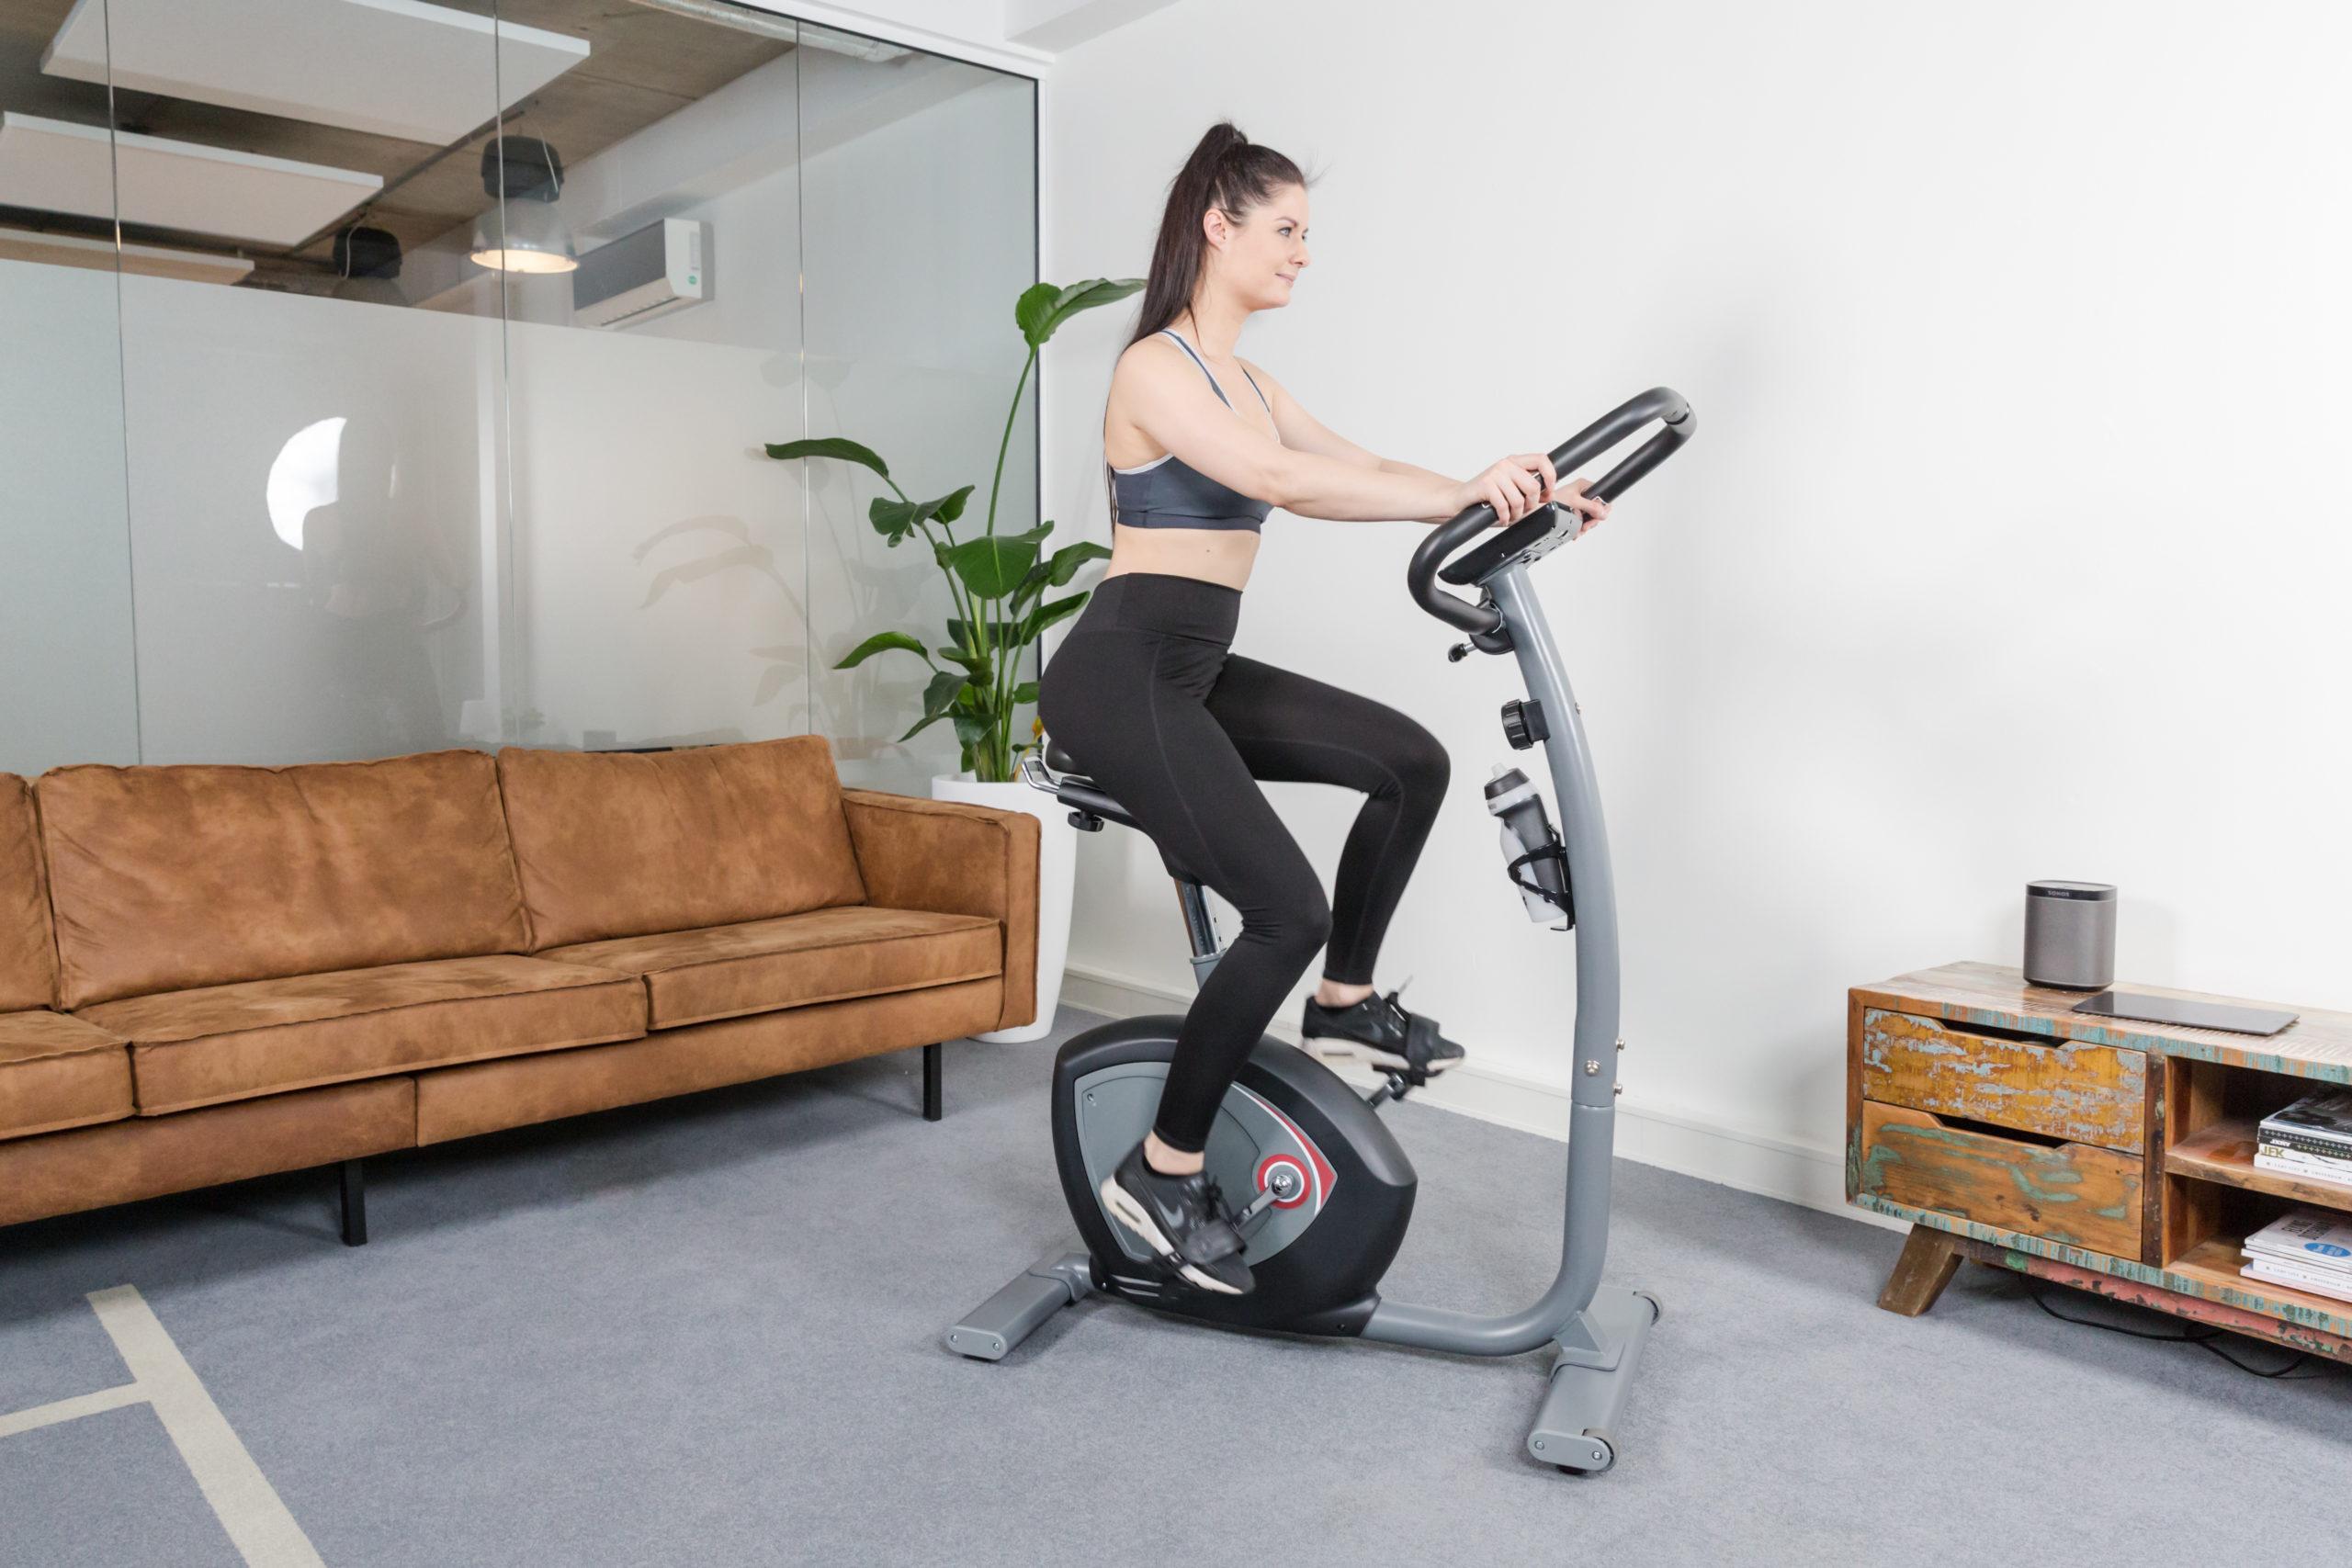 Flow Fitness Tabel Turner DHT500 Hometrainer 9